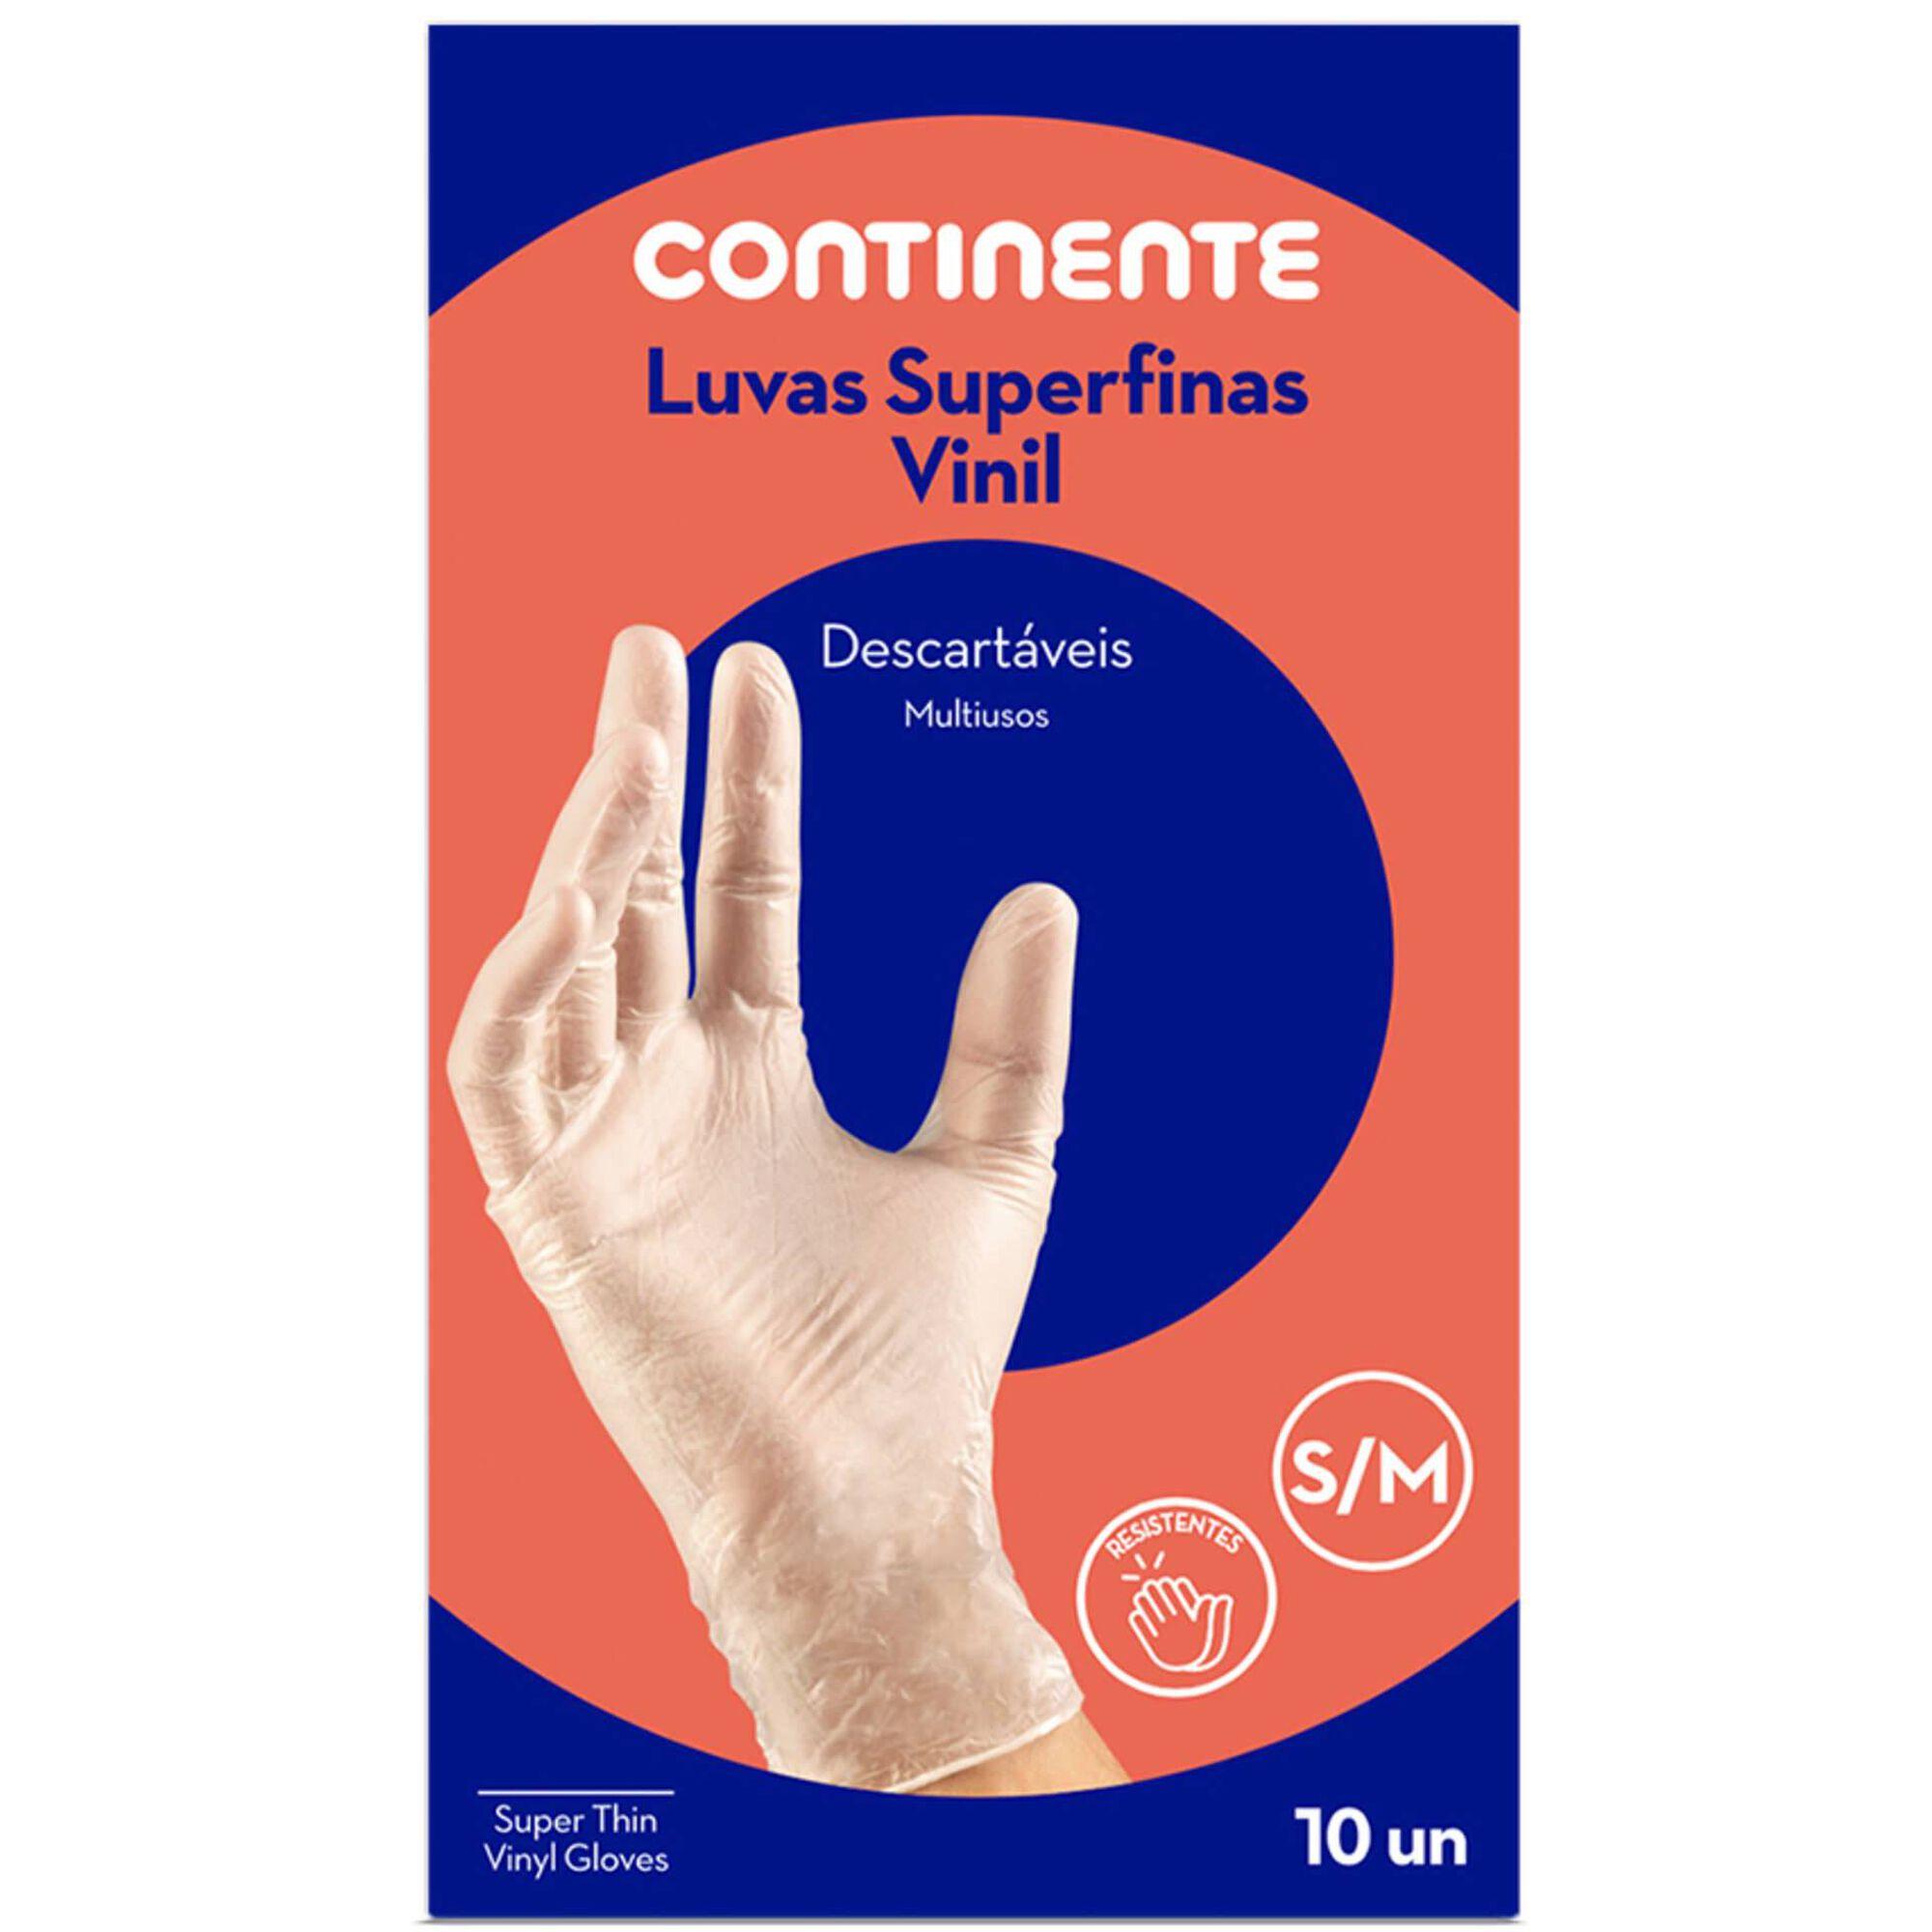 Luvas Descartáveis Superfinas Vinil Tam. S/M